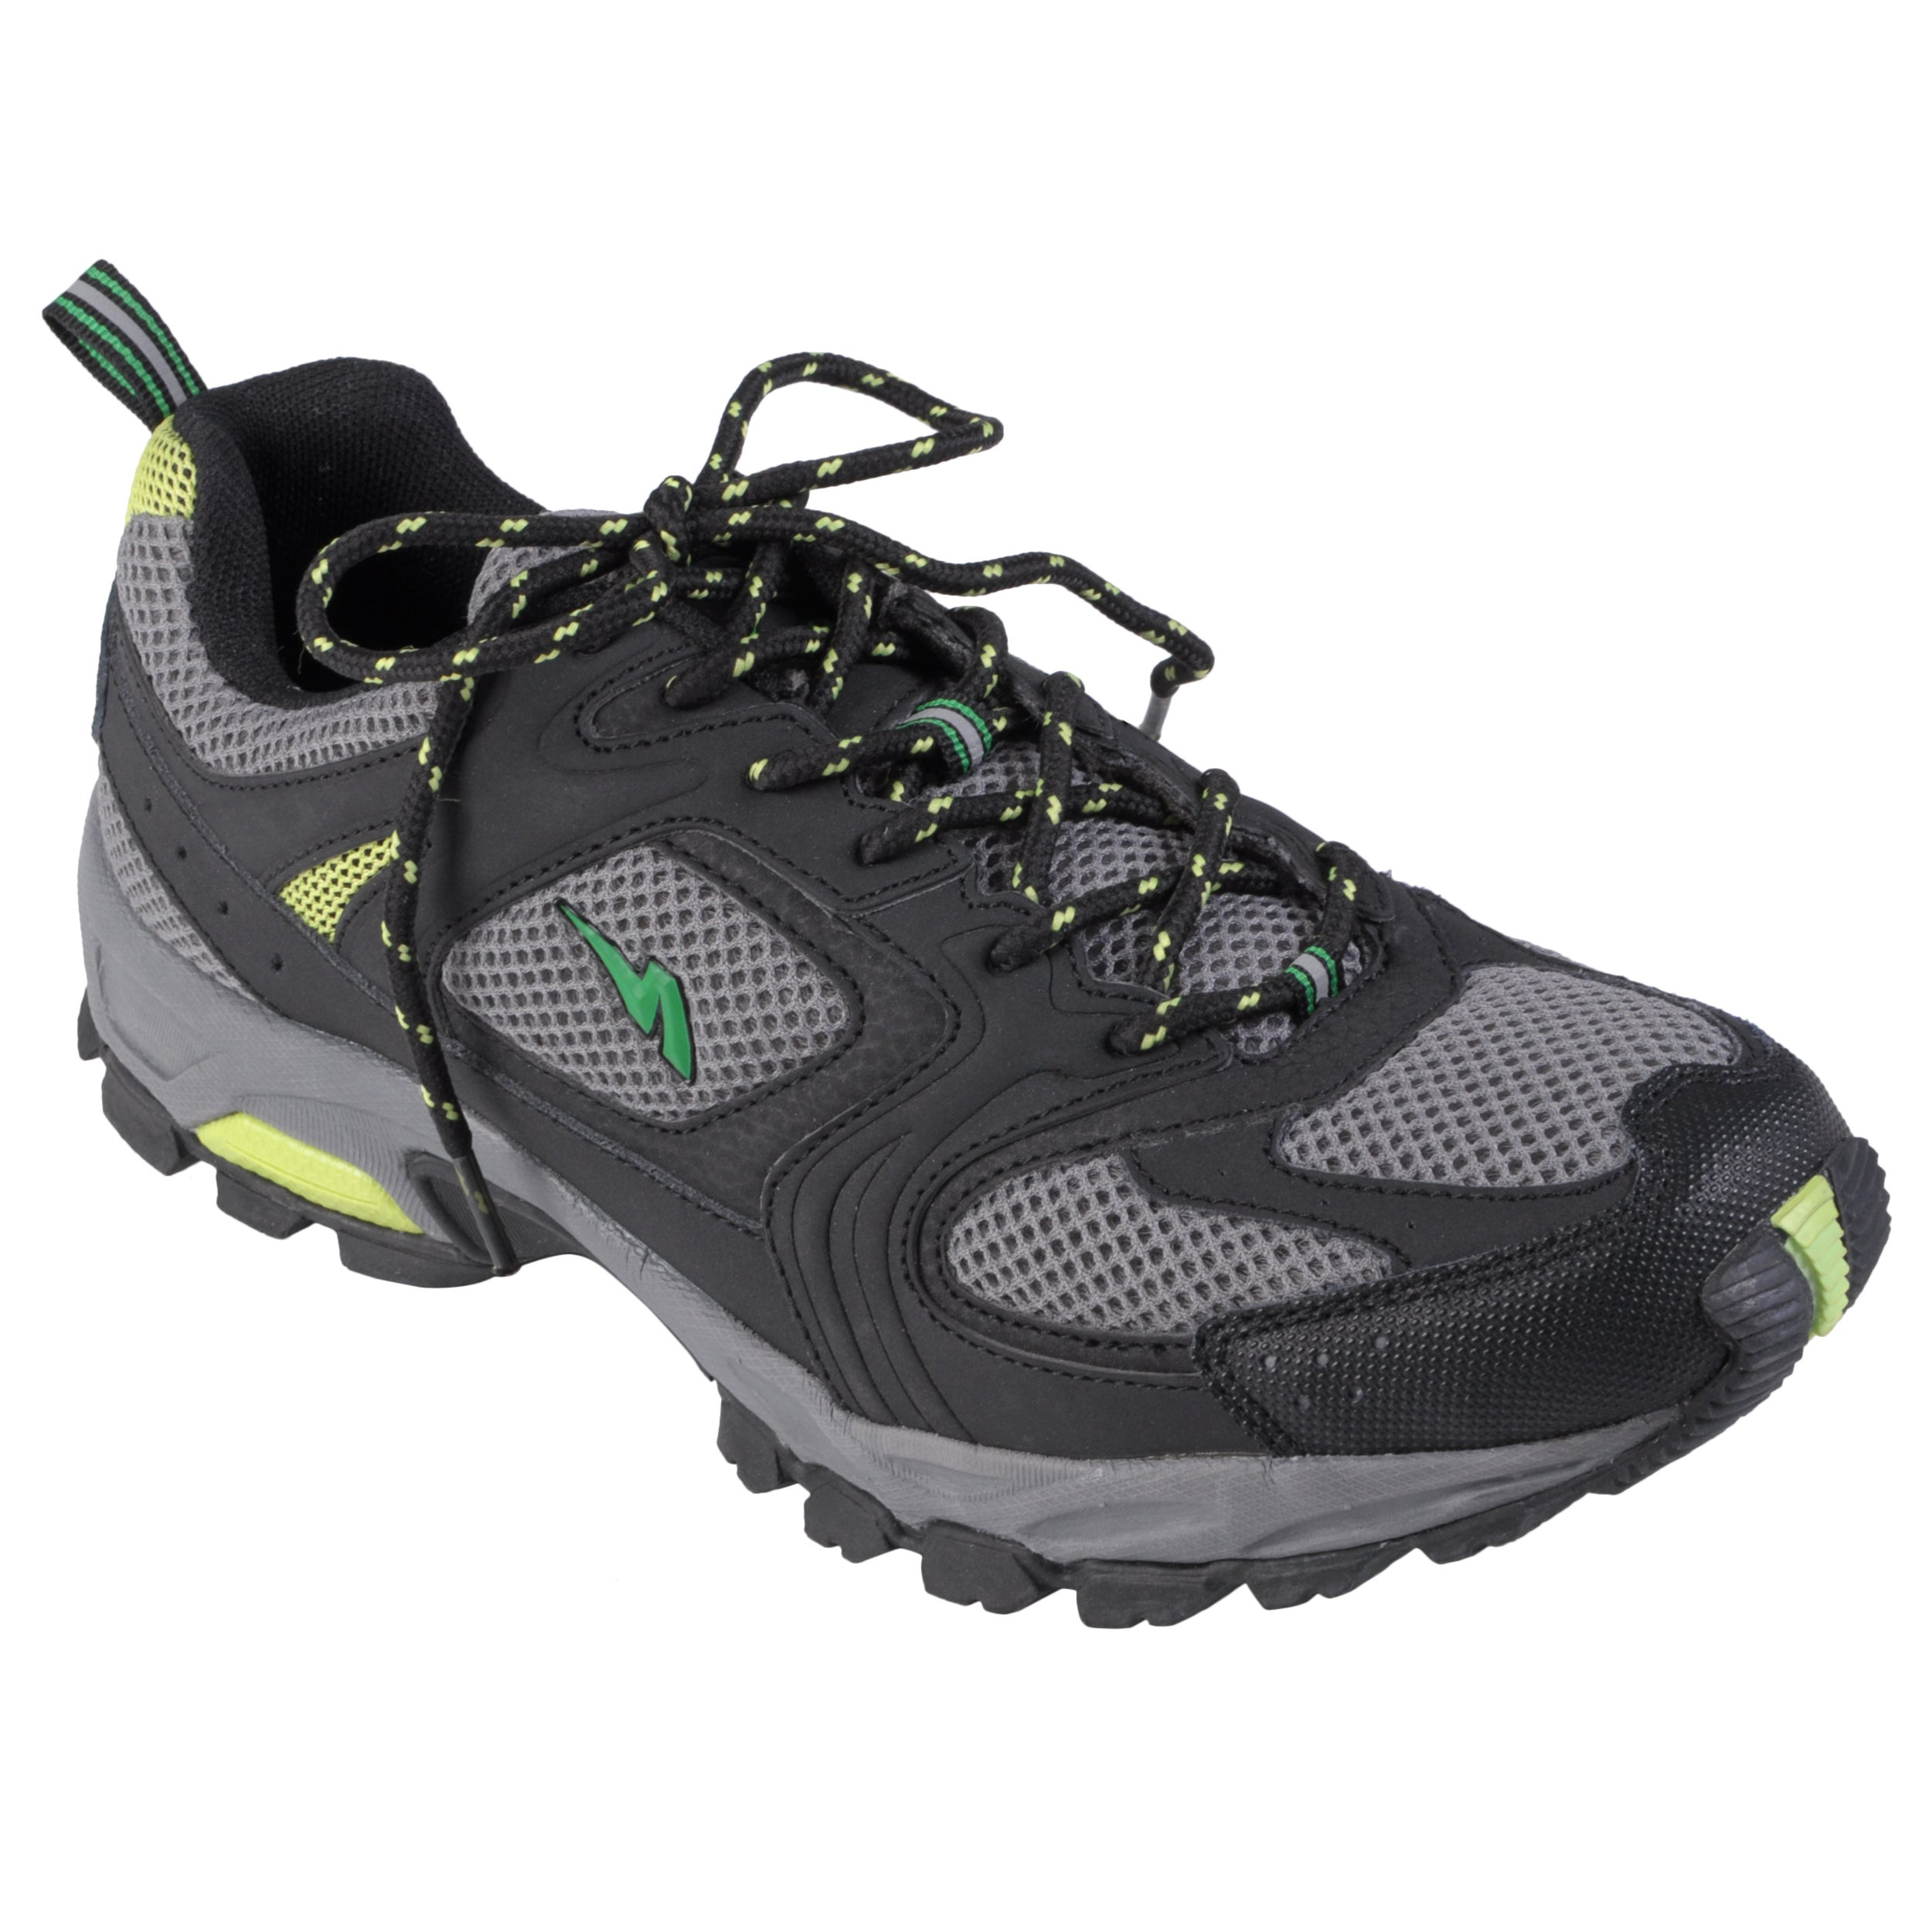 Boston Traveler Men's Composite Lace-up Running Shoes